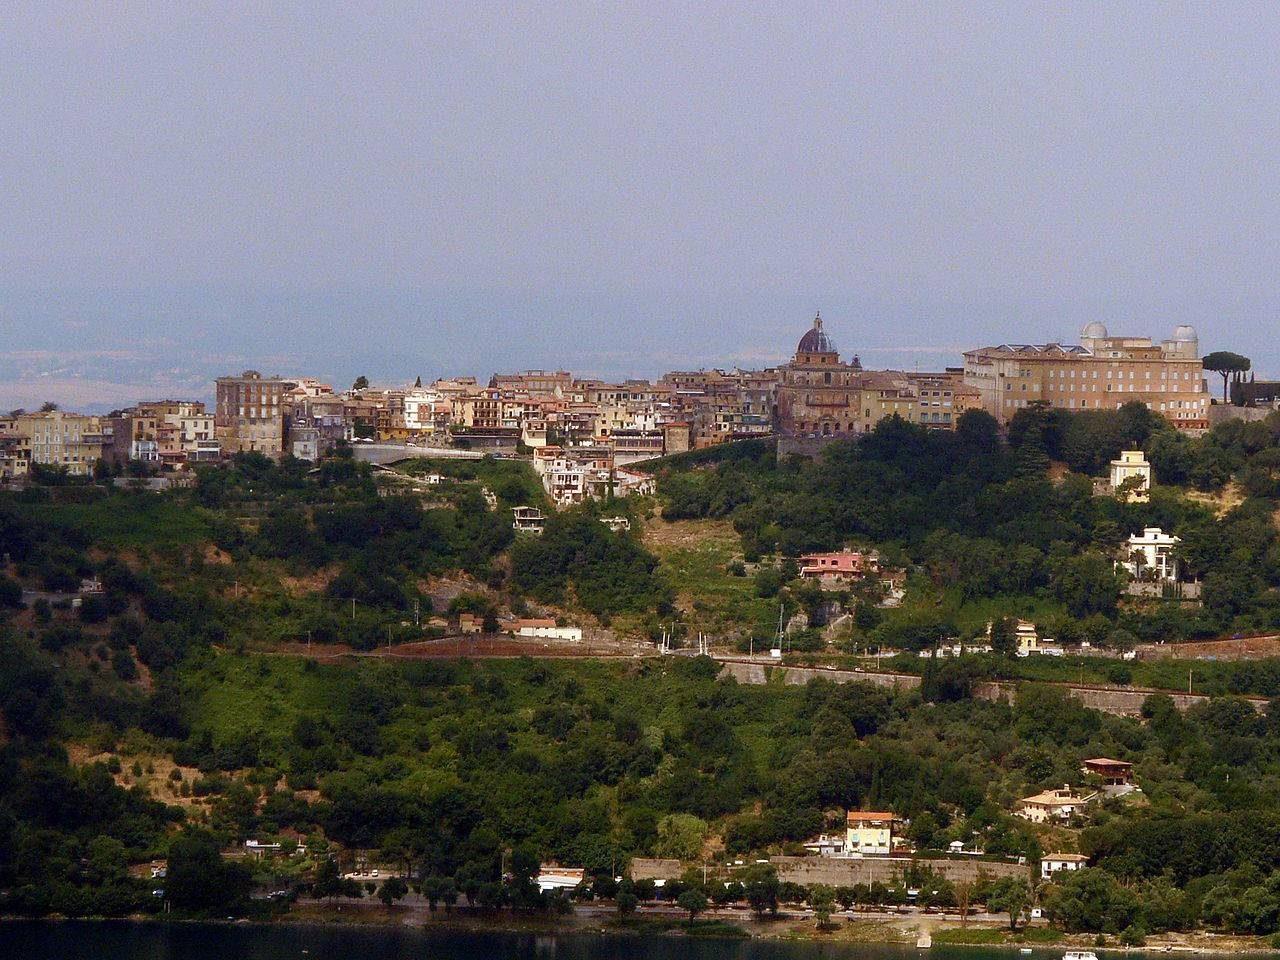 castelli romani castel gandolfo